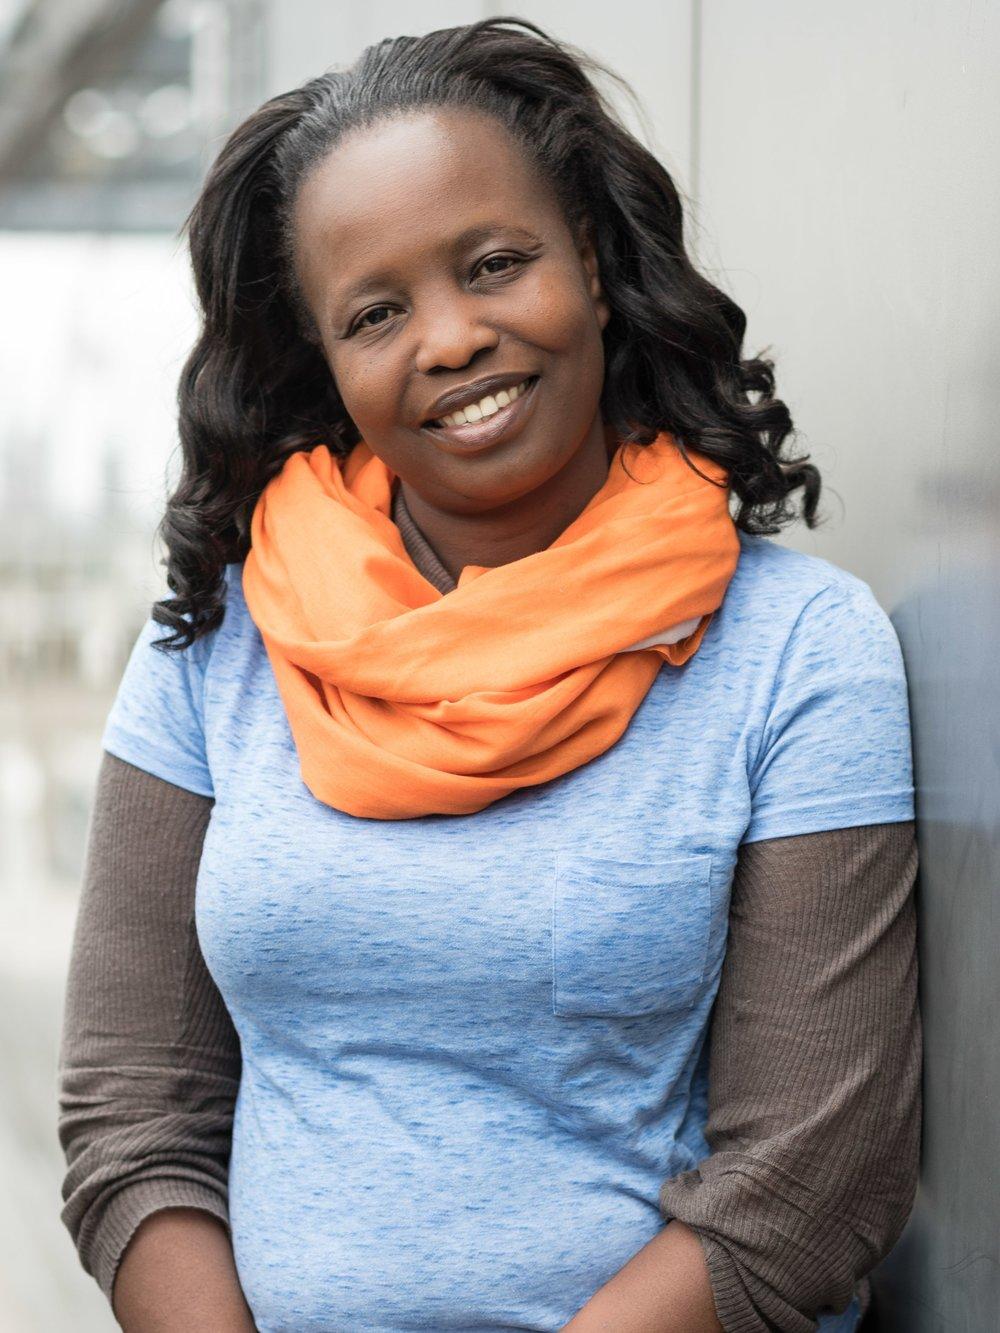 Roseline Orwa - Nationality: KenyanLiving in: Nairobi, KenyaTwitter: @roselineorwaFacebook: @ronafoundation @roseline.orwa